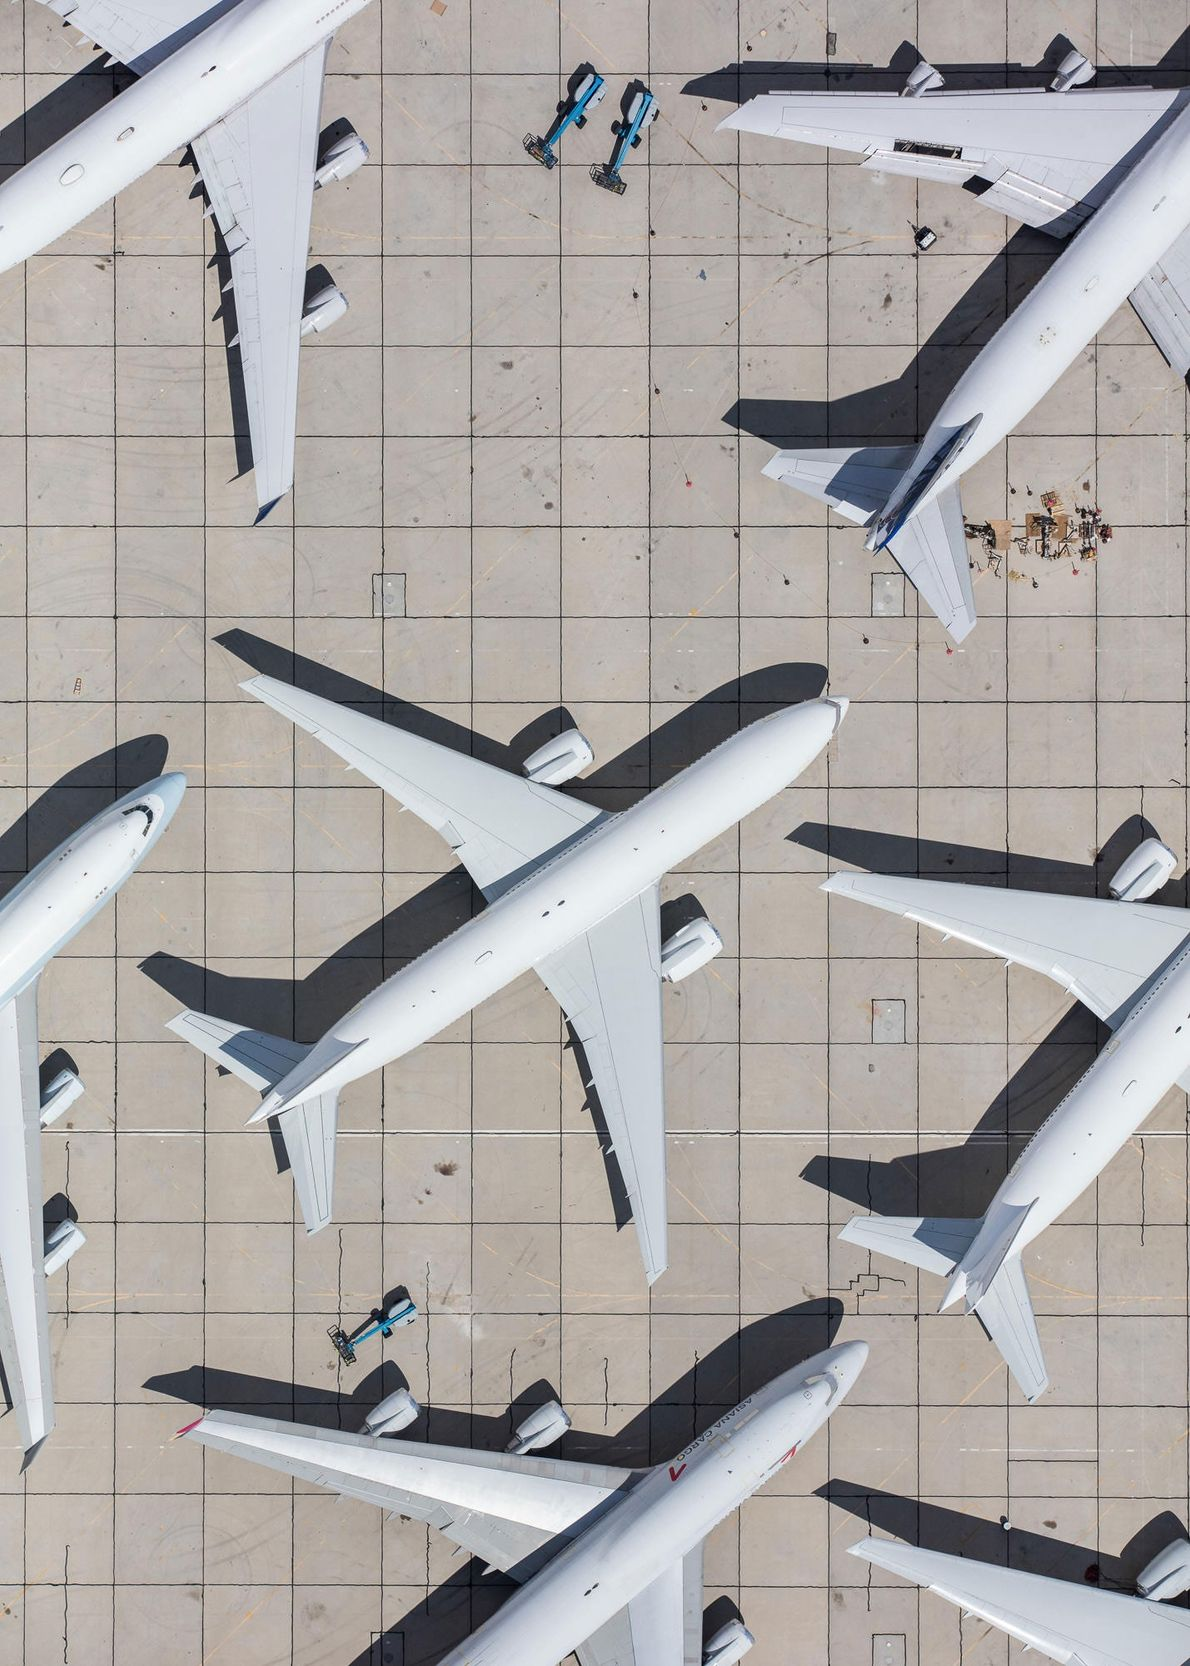 Aircraft await maintenance in Victorville, California.